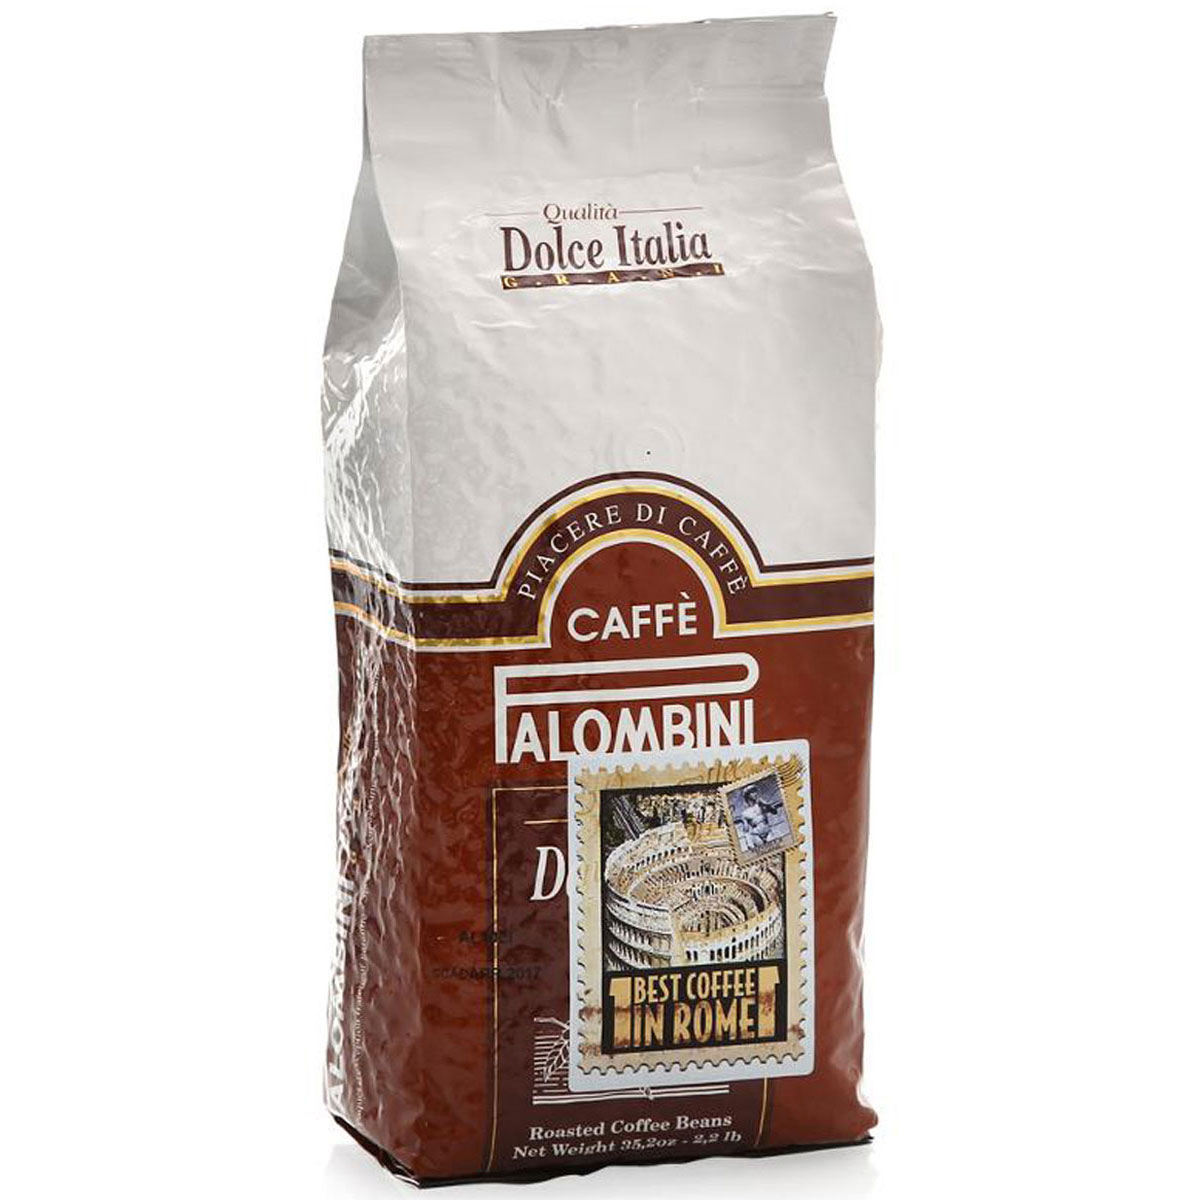 Palombini Dolce Italia кофе в зернах, 1 кг palombini кухня